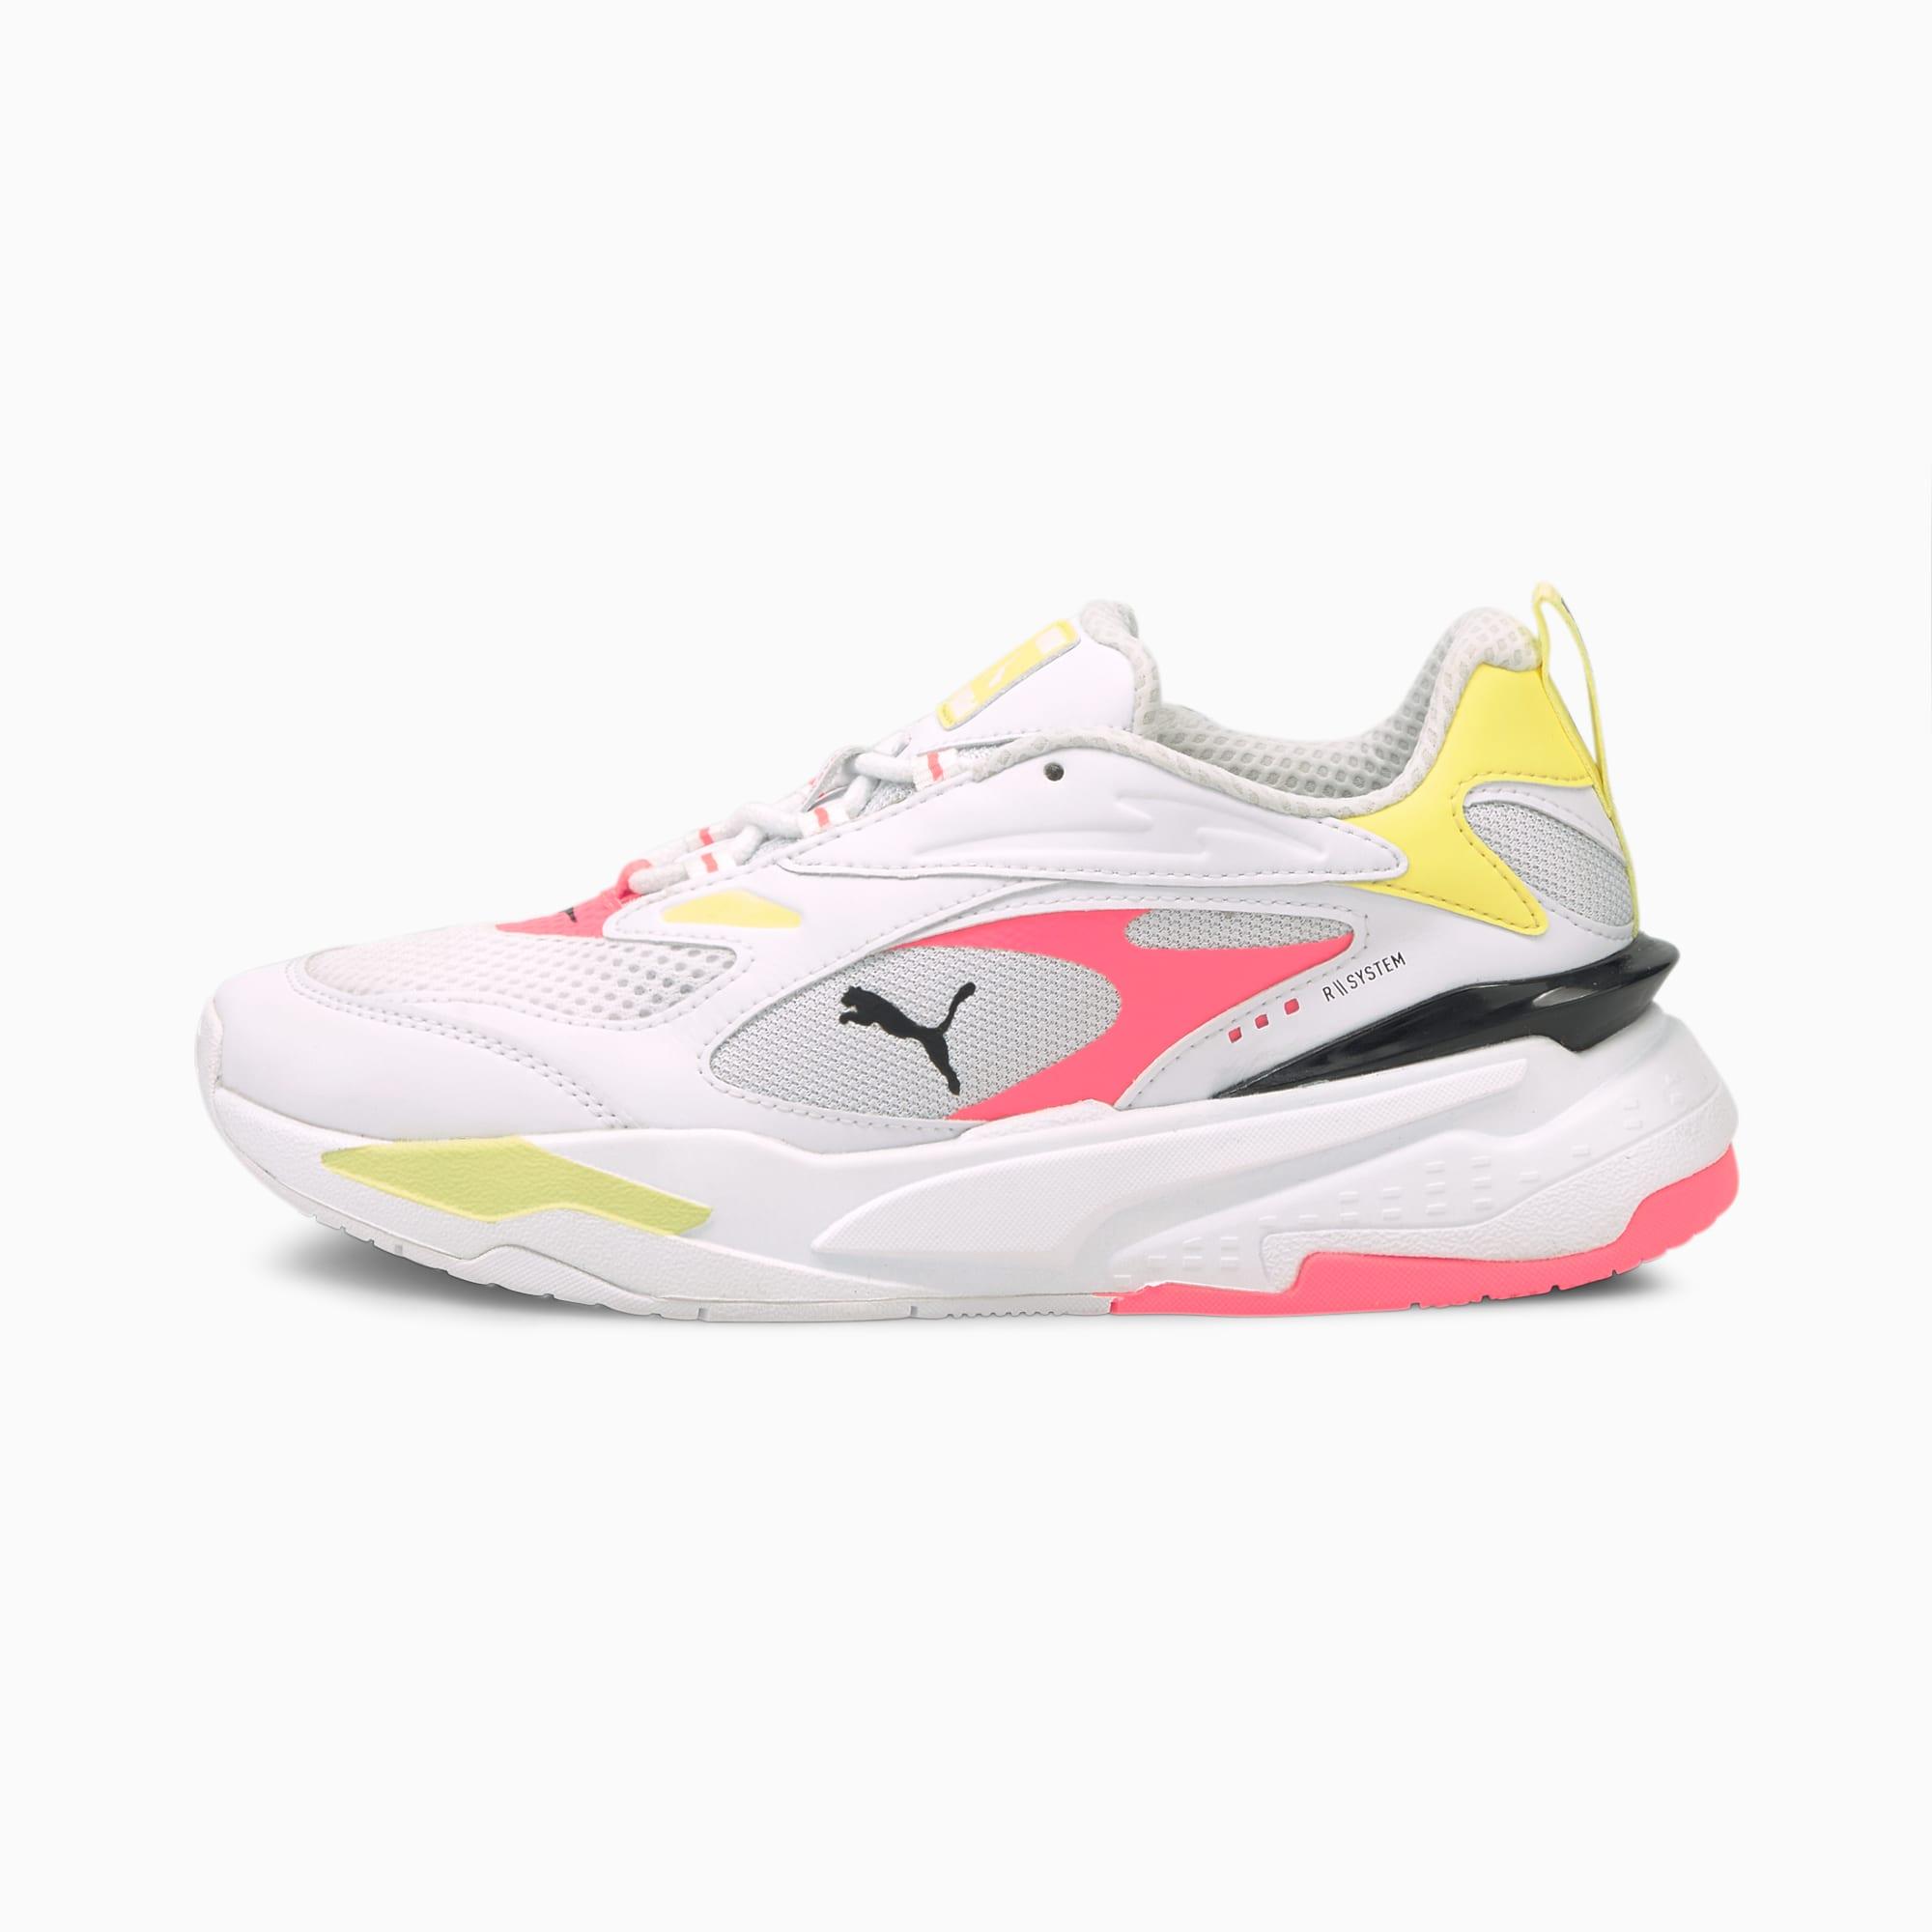 PUMA RS-Fast Pop Damen Sneaker Schuhe   Mit Aucun   Weiß/Rosa   Größe: 38.5